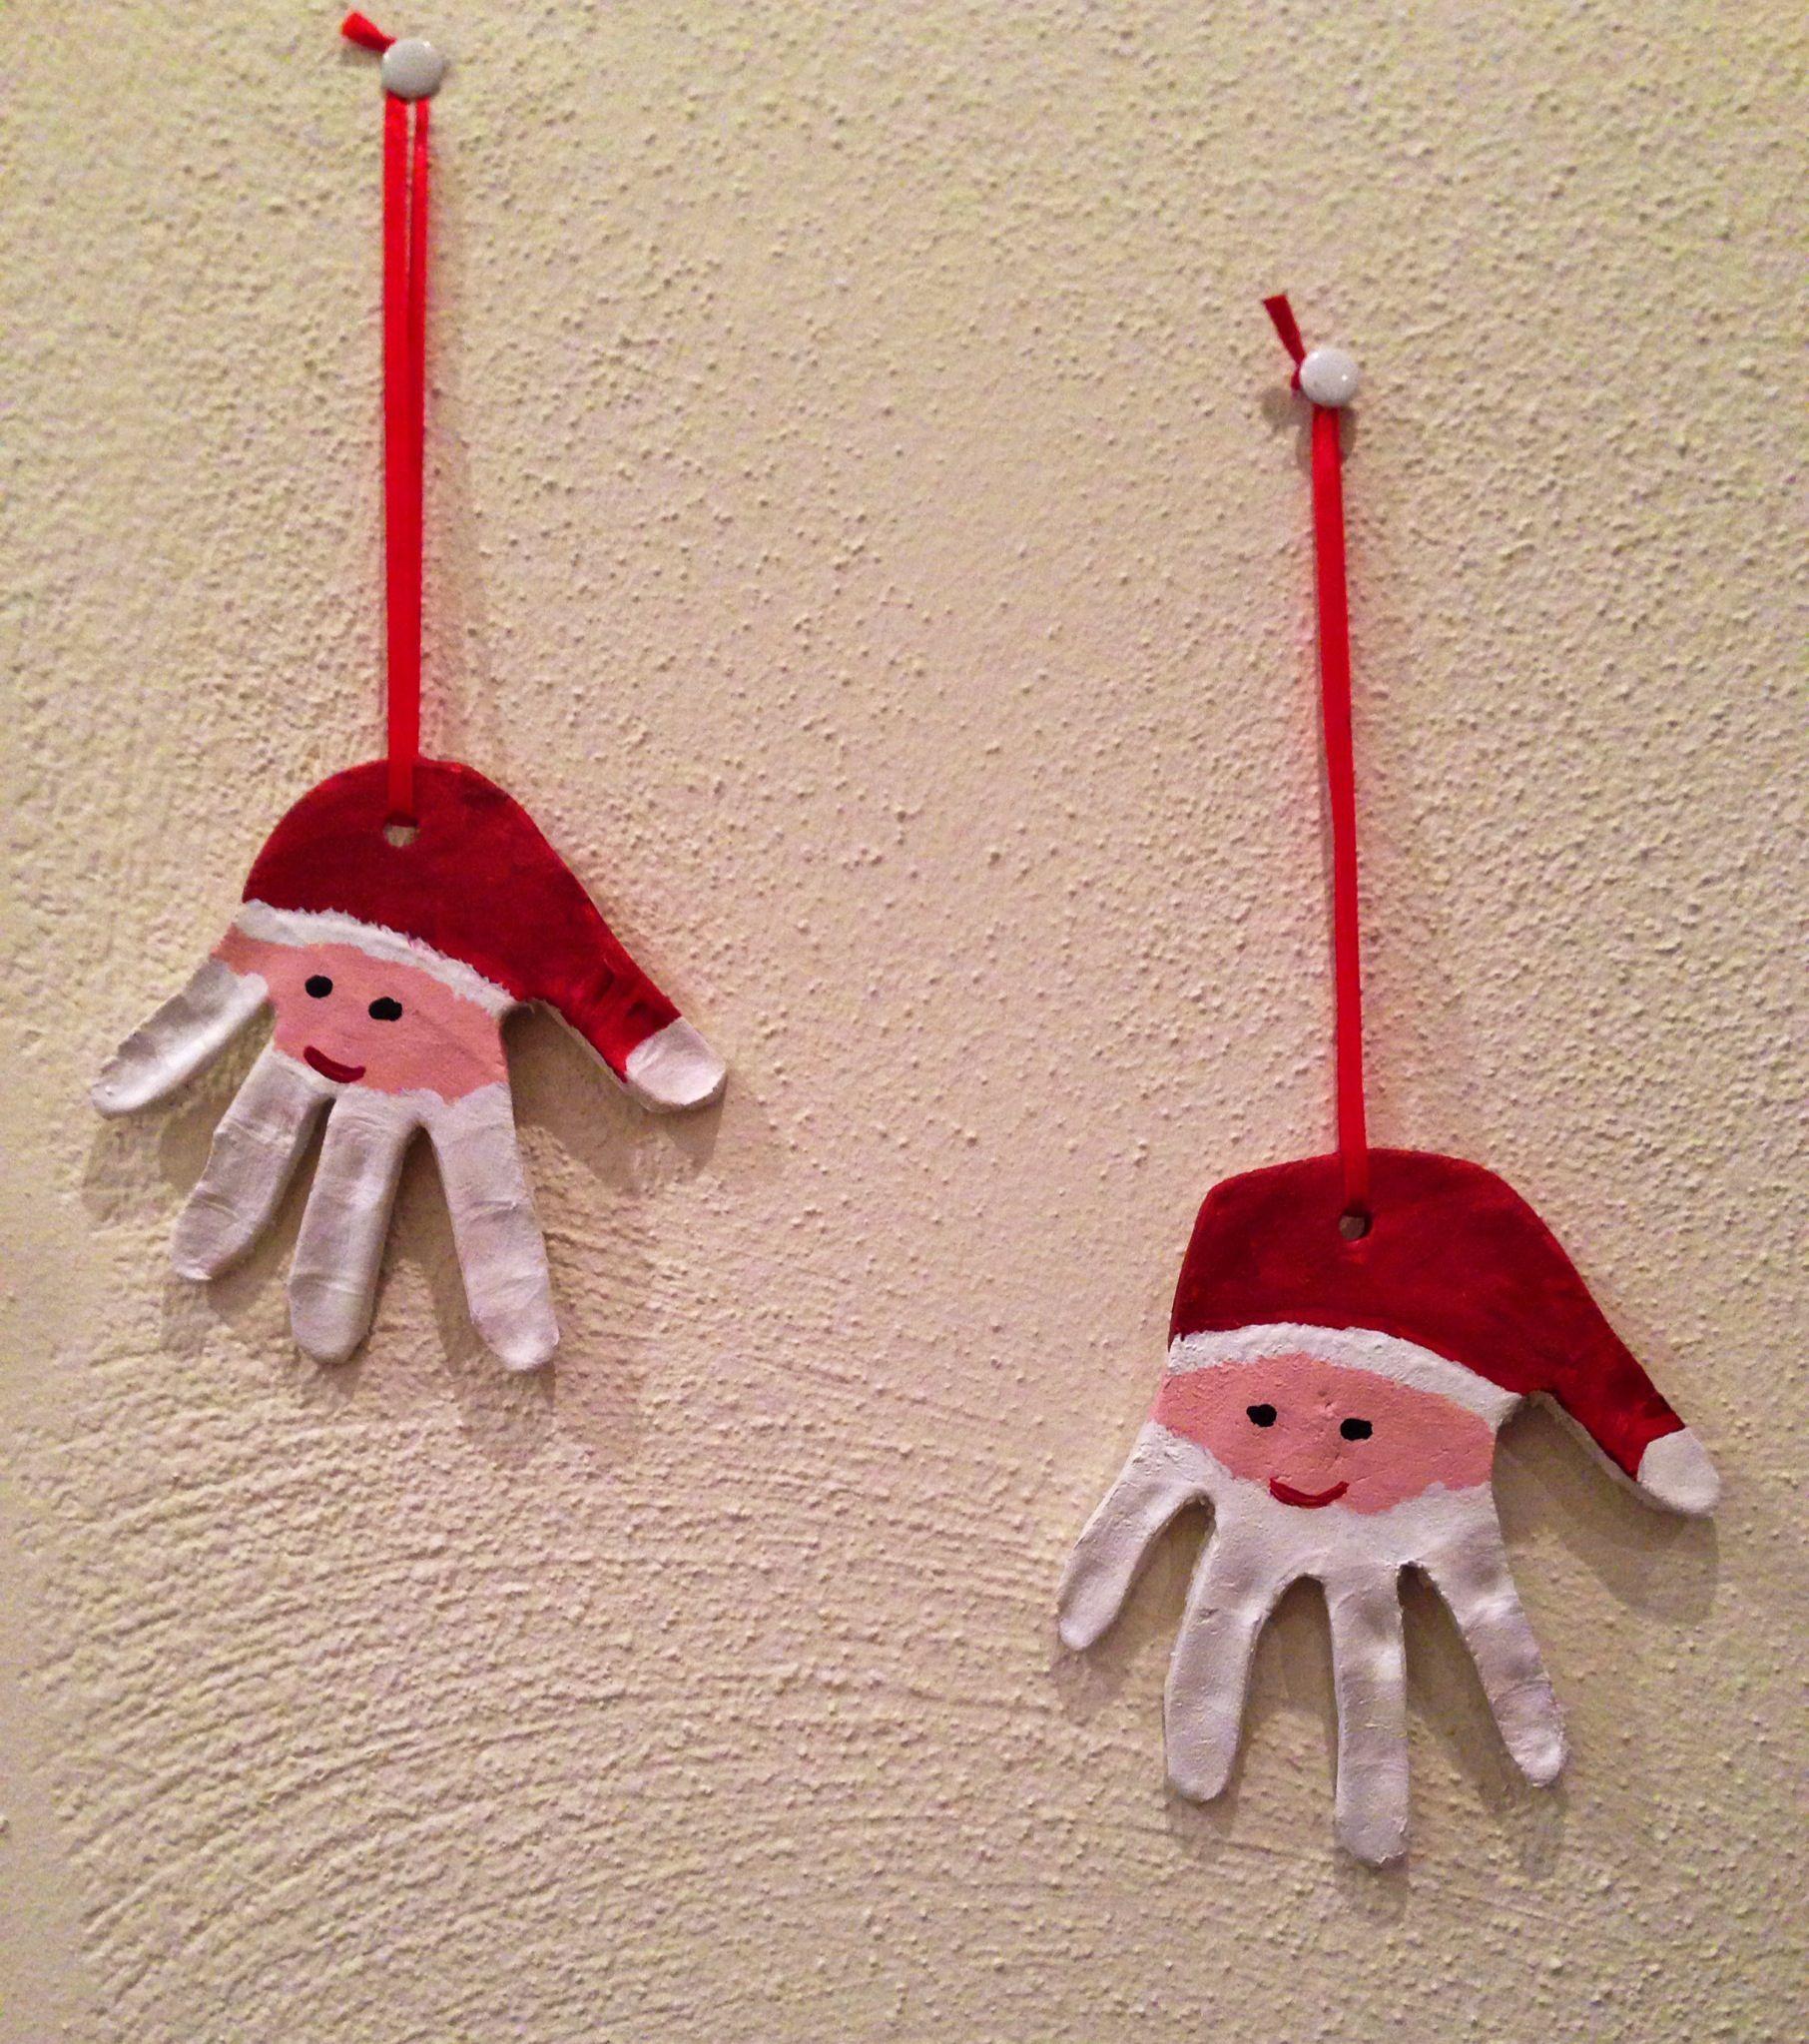 Handprint santa ornament handabdruck nikolaus basteln for Nikolaus dekoration basteln